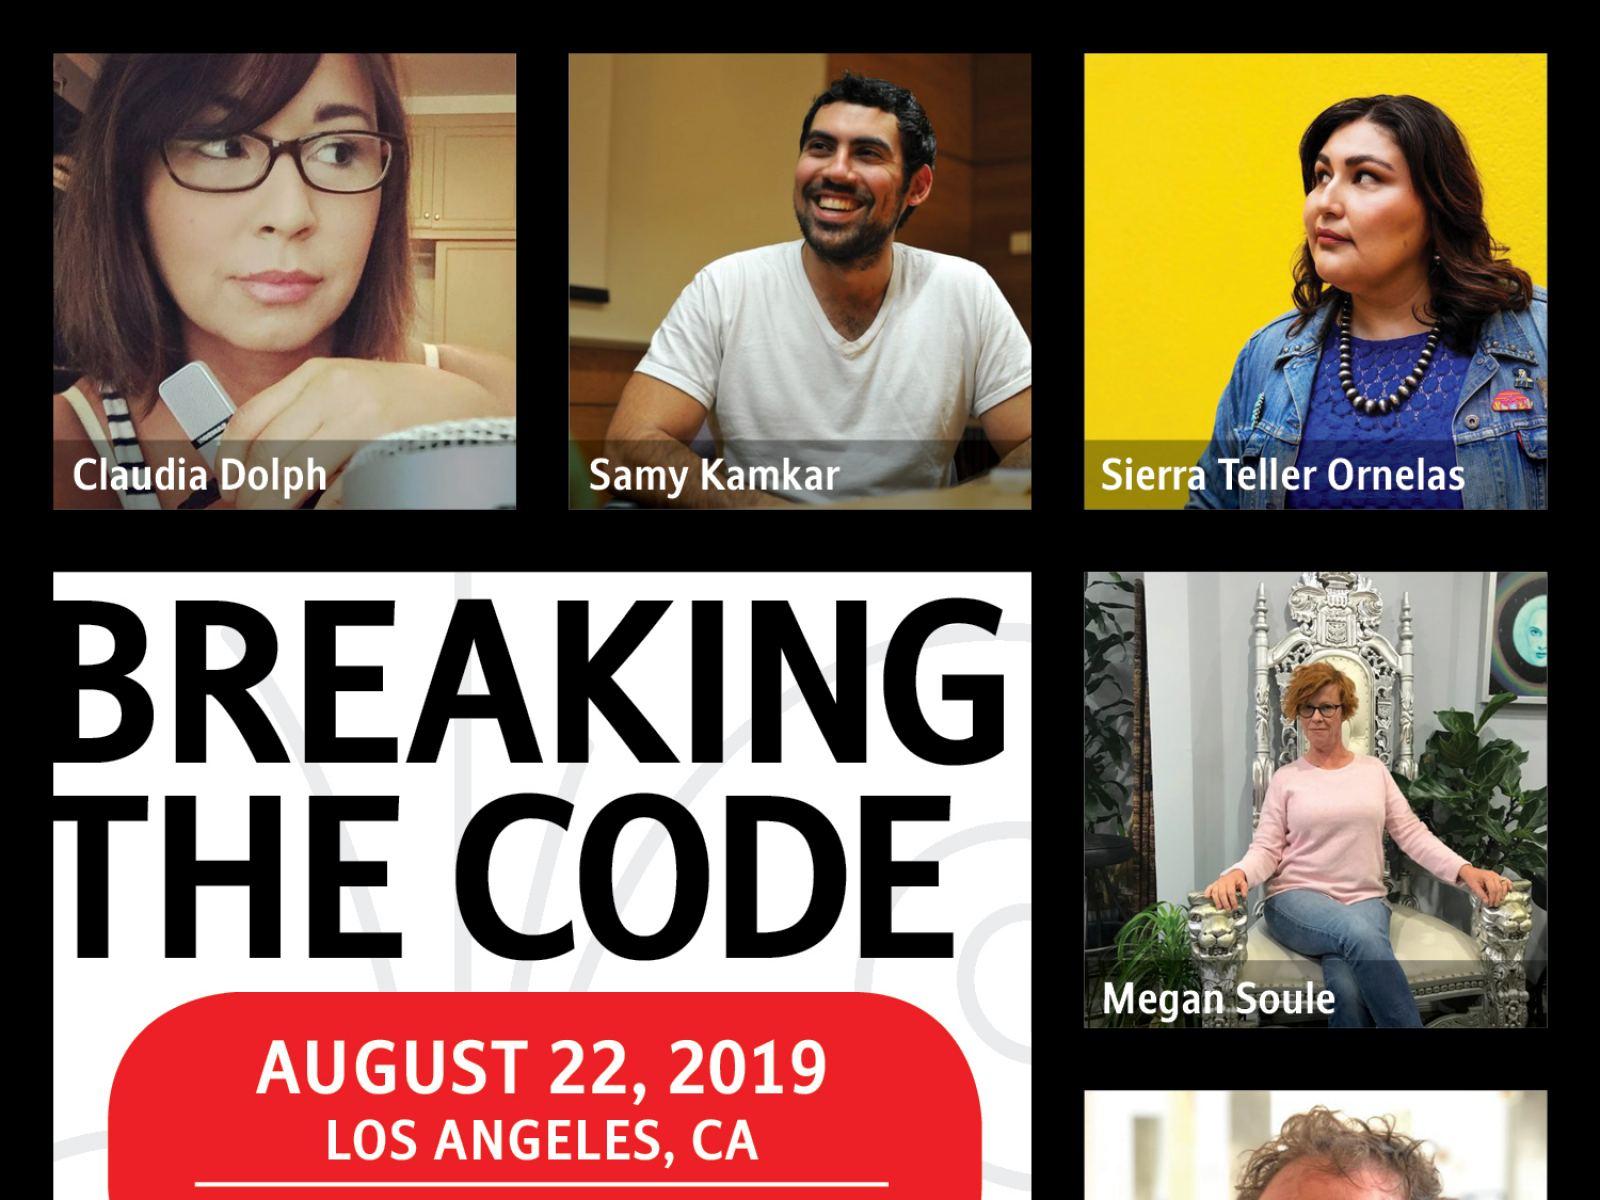 Los Angeles Story Collider storytellers for August 22, 2019. Claudia Dolph, Samy Kamkar, Sierra Teller Ornelas, Megan Whyte Soule and Derek Traub.